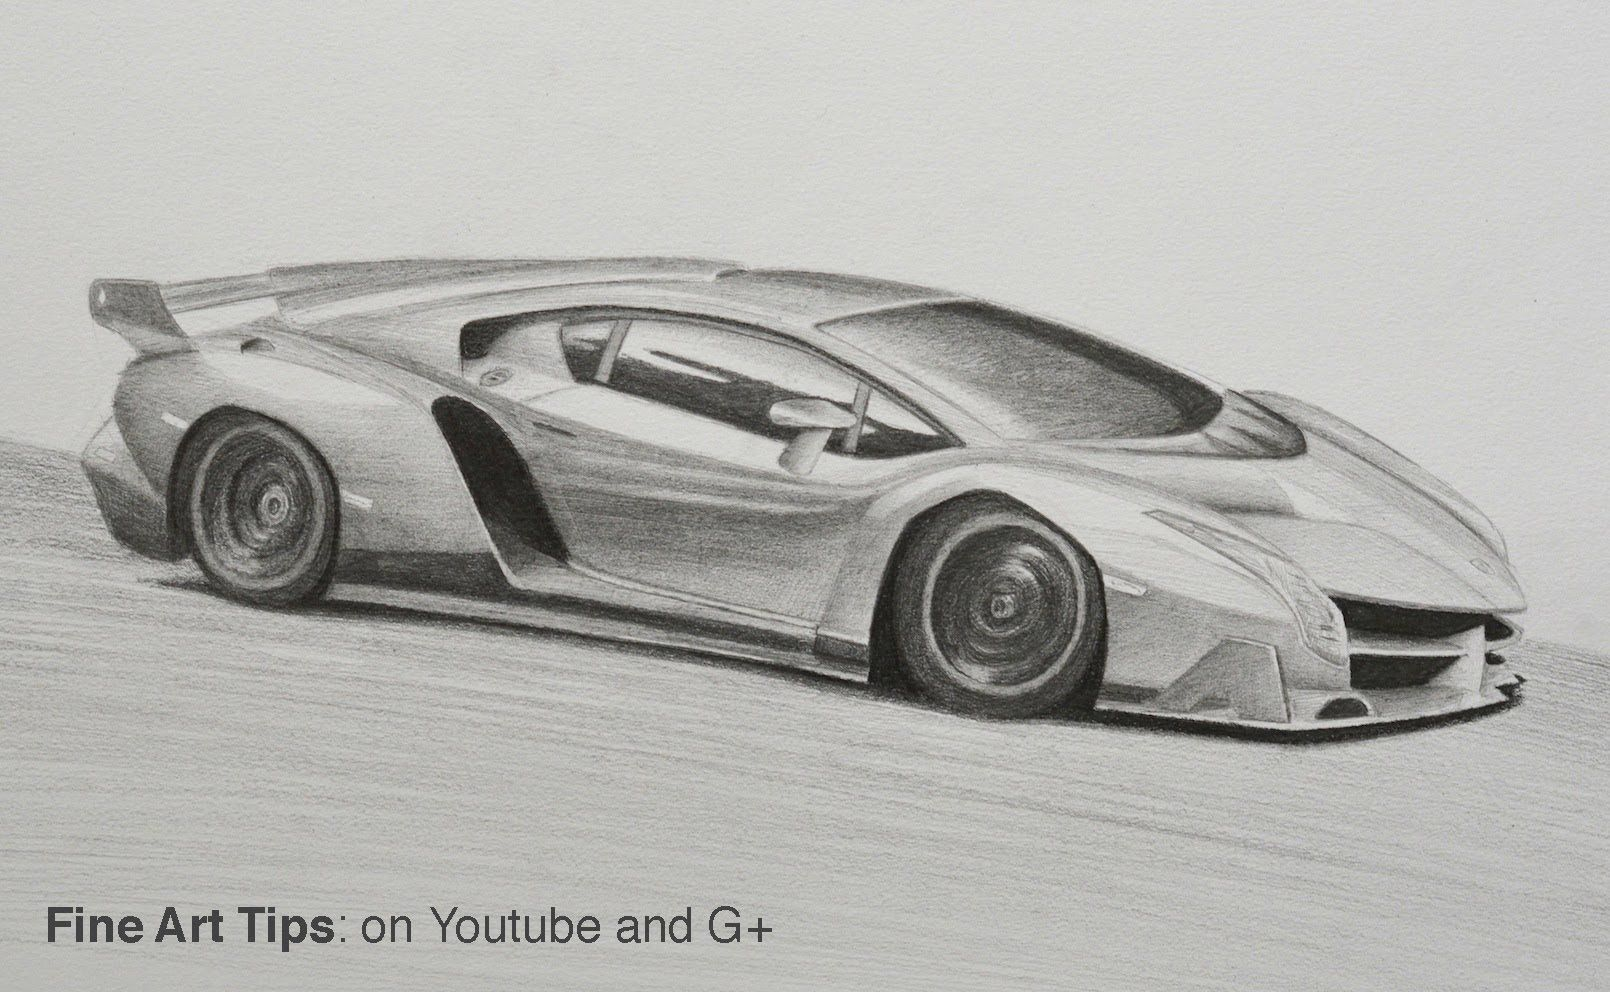 How to Draw a Lambhini Veneno Cars in 2019